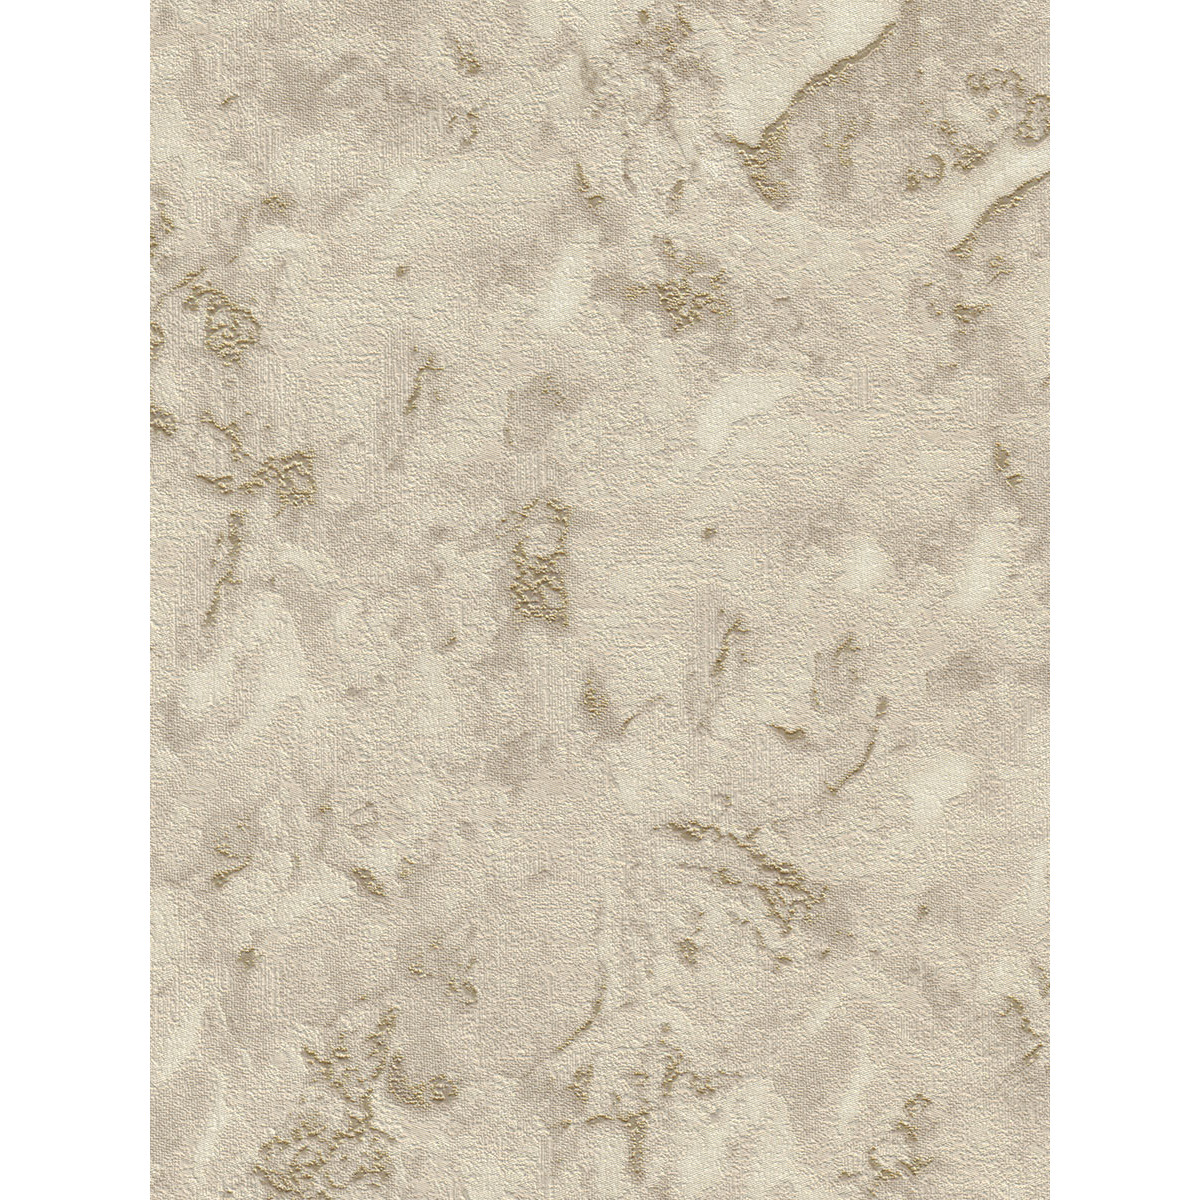 Обои флизелиновые Monte Solaro Dante розовые 9045-17 1.06 м